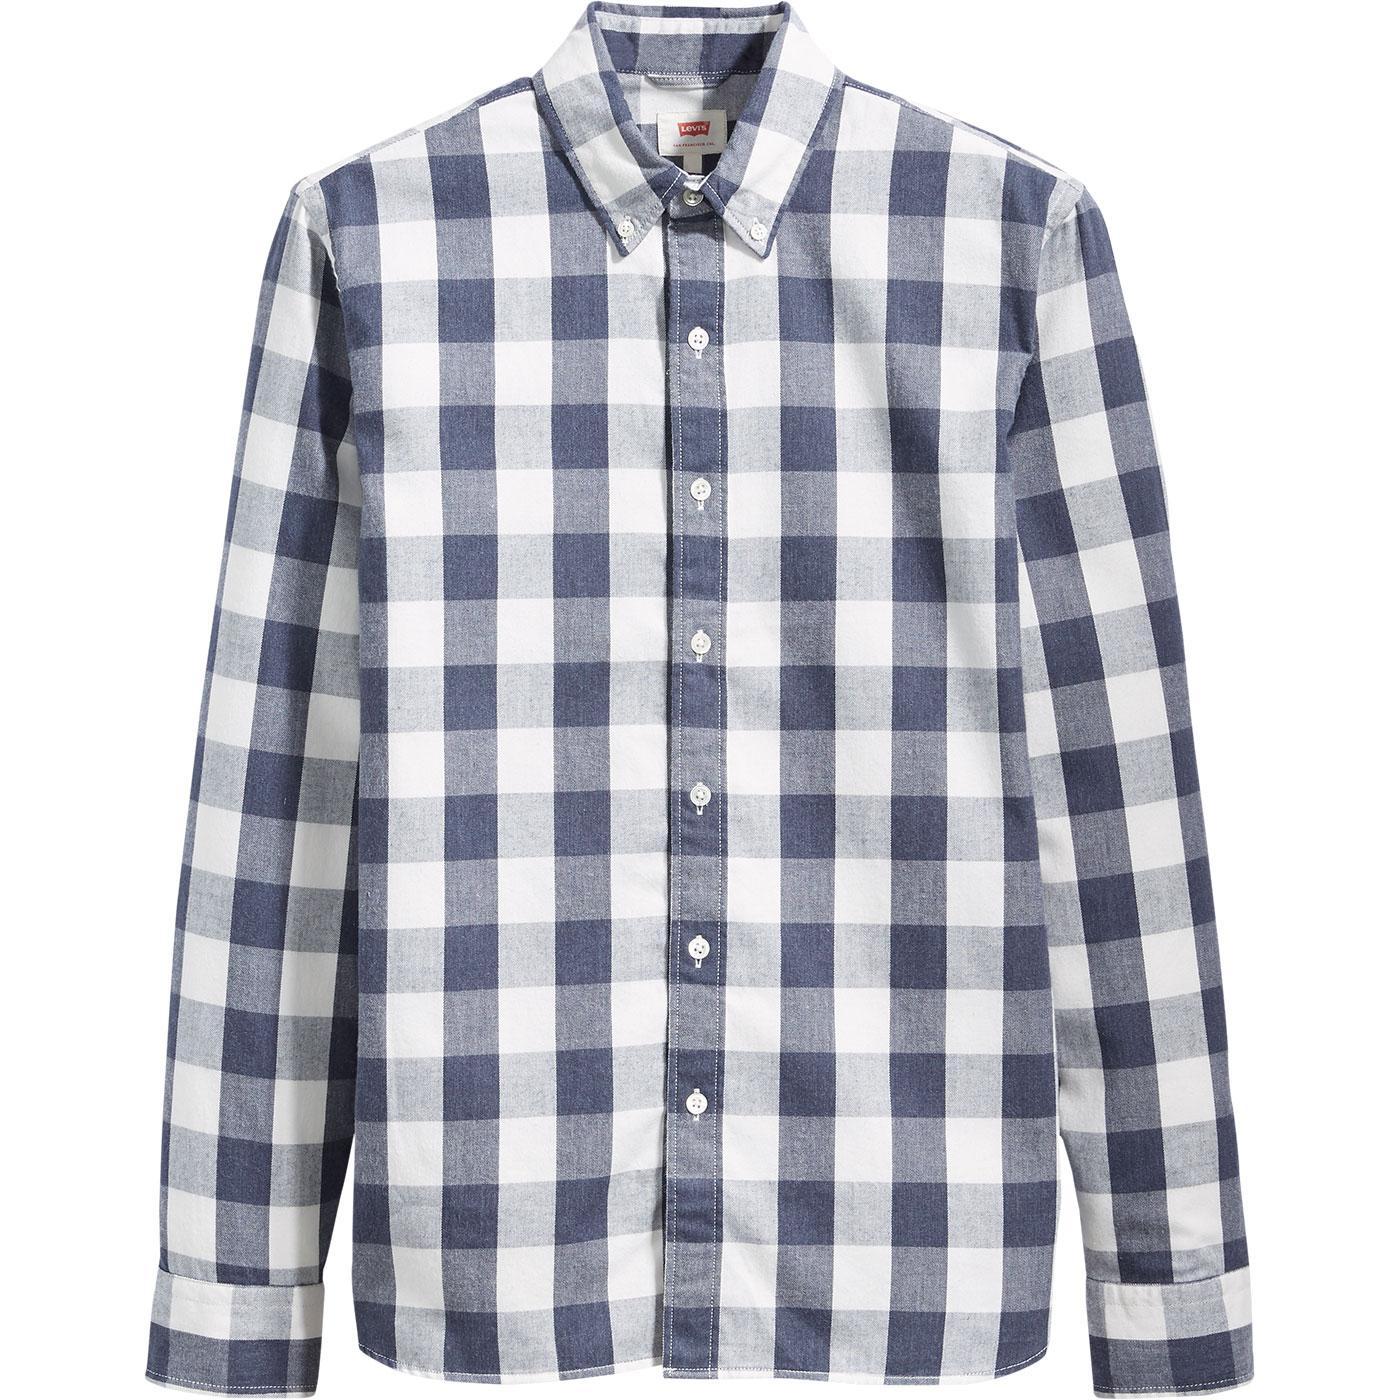 LEVI'S Men's Retro Mod Block Check No Pocket Shirt